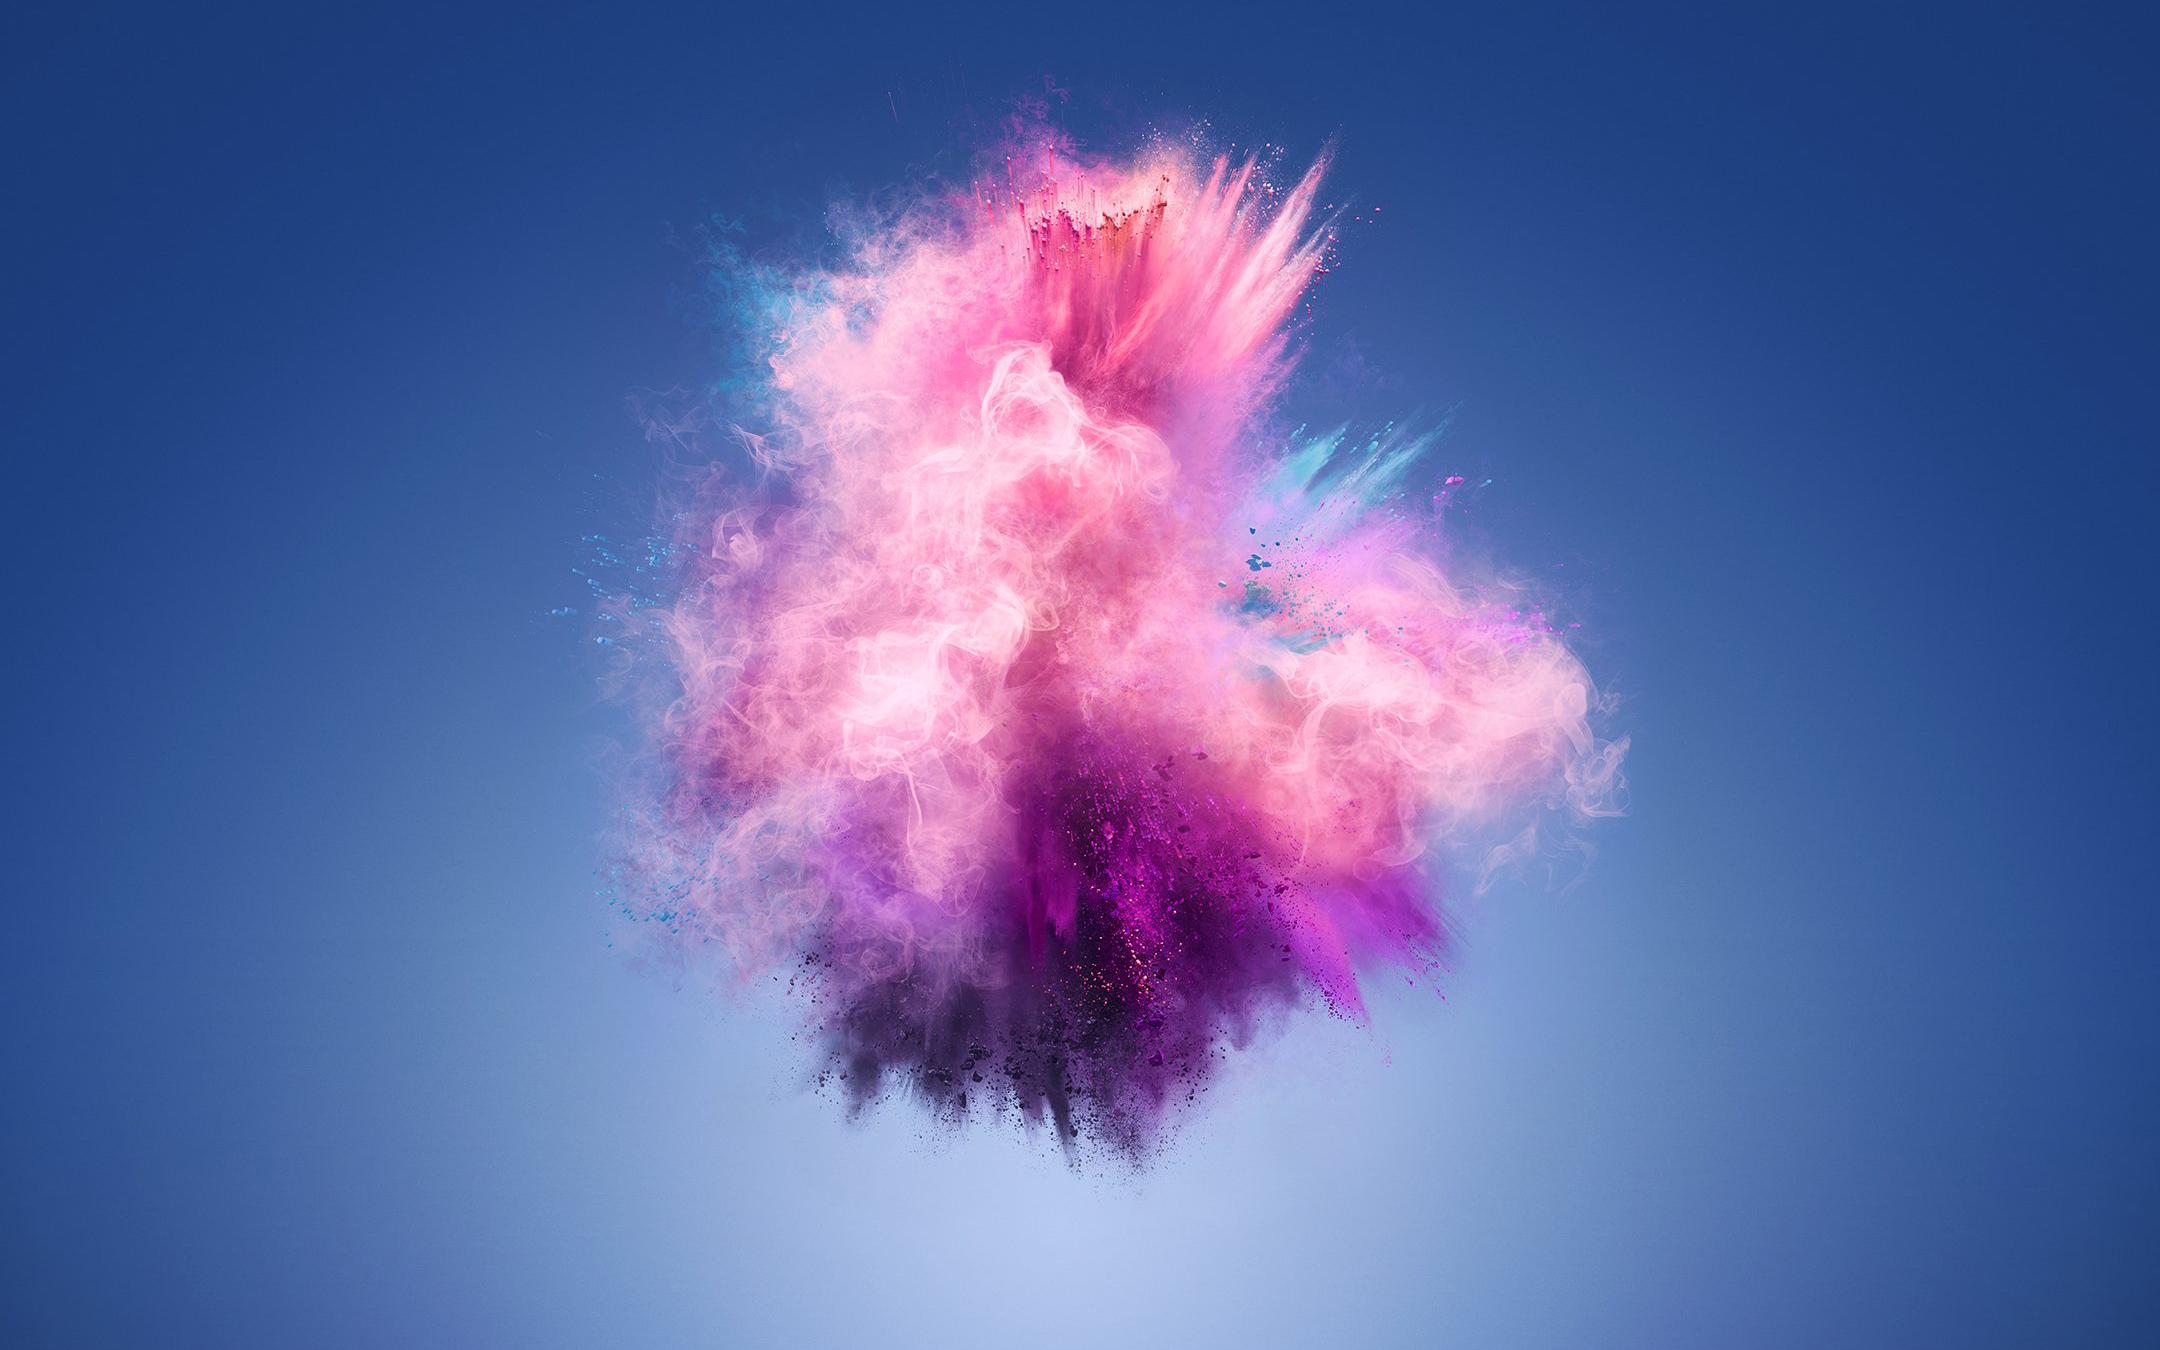 Color Splash Huawei 7s Stock Wallpaper Download High Resolution 4k Wallpaper